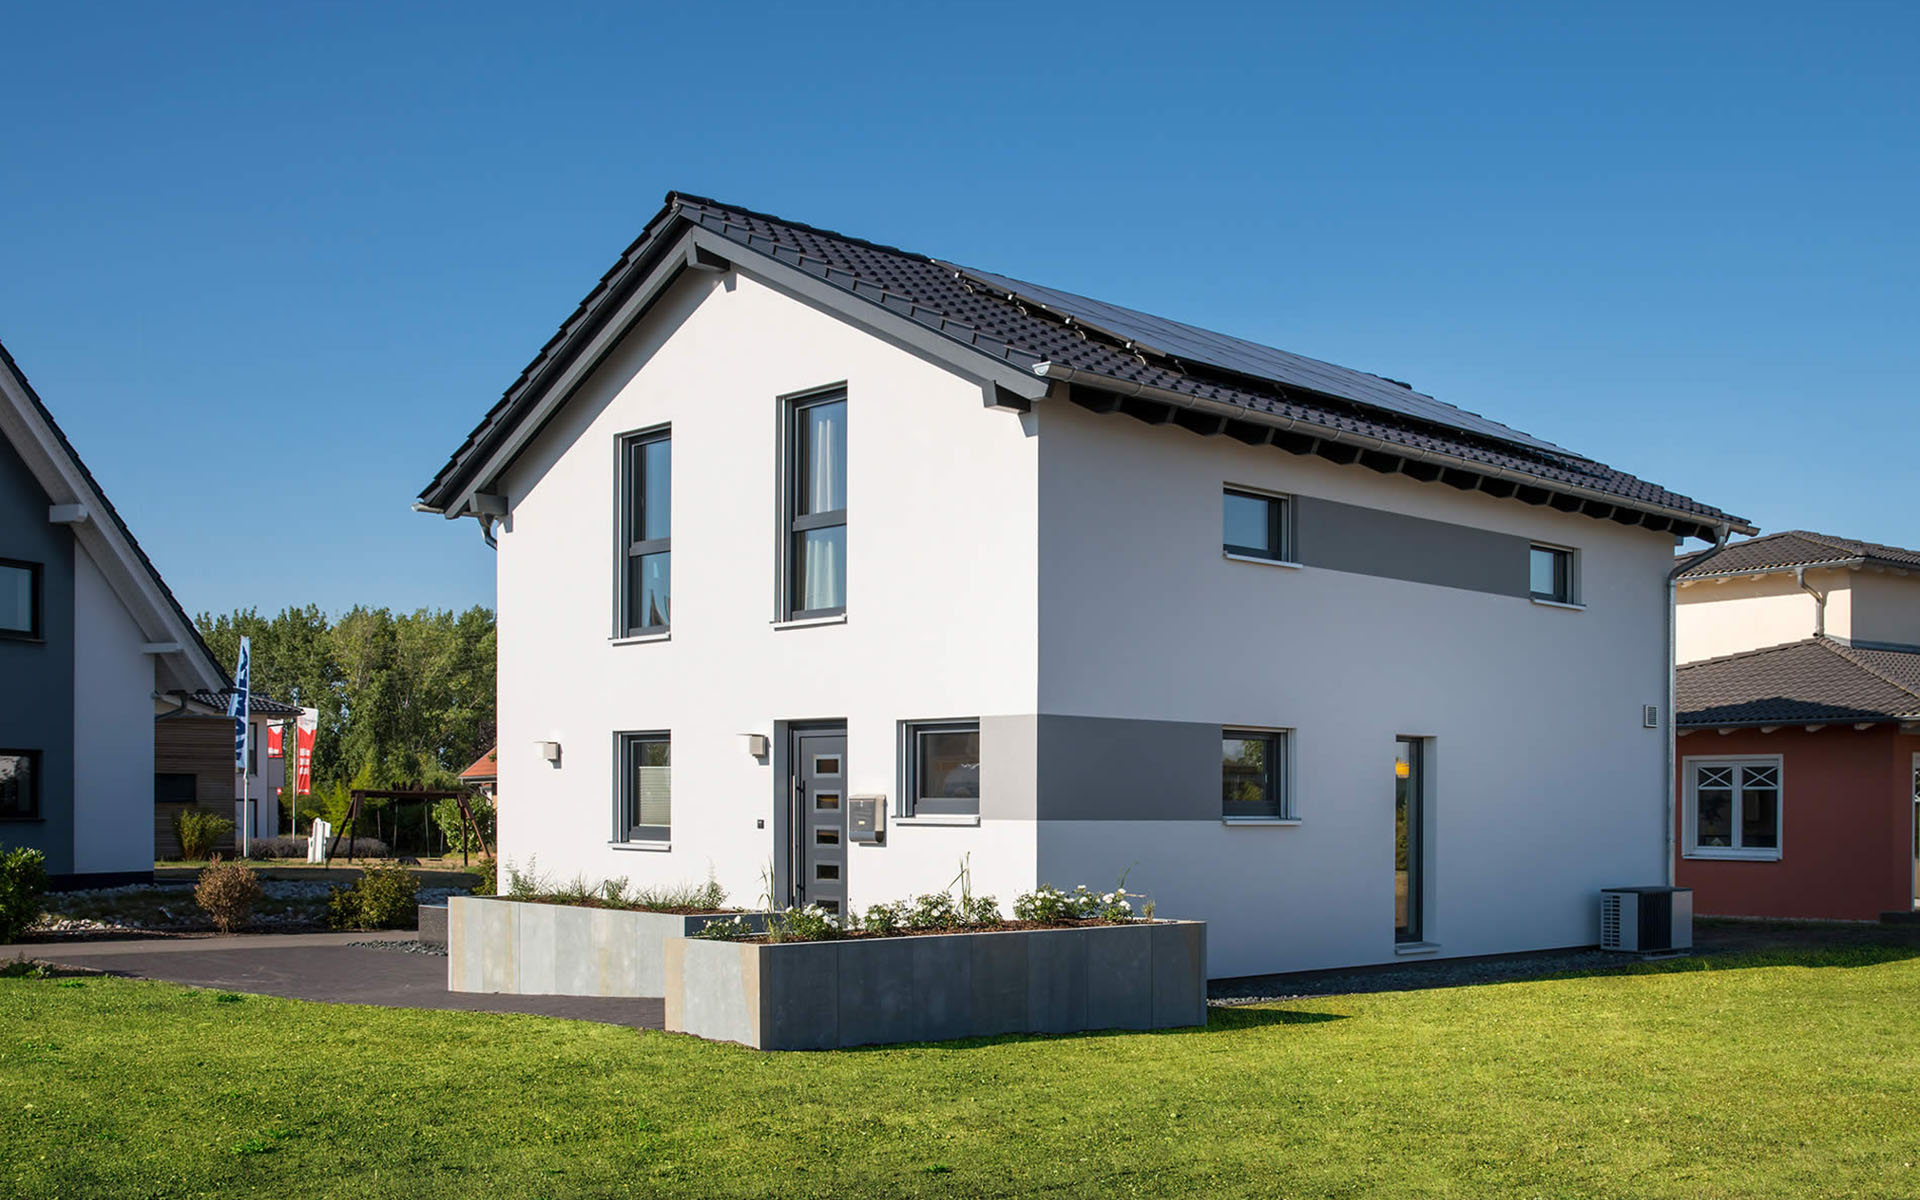 UNO 2.0 - Musterhaus Leipzig von FingerHaus GmbH